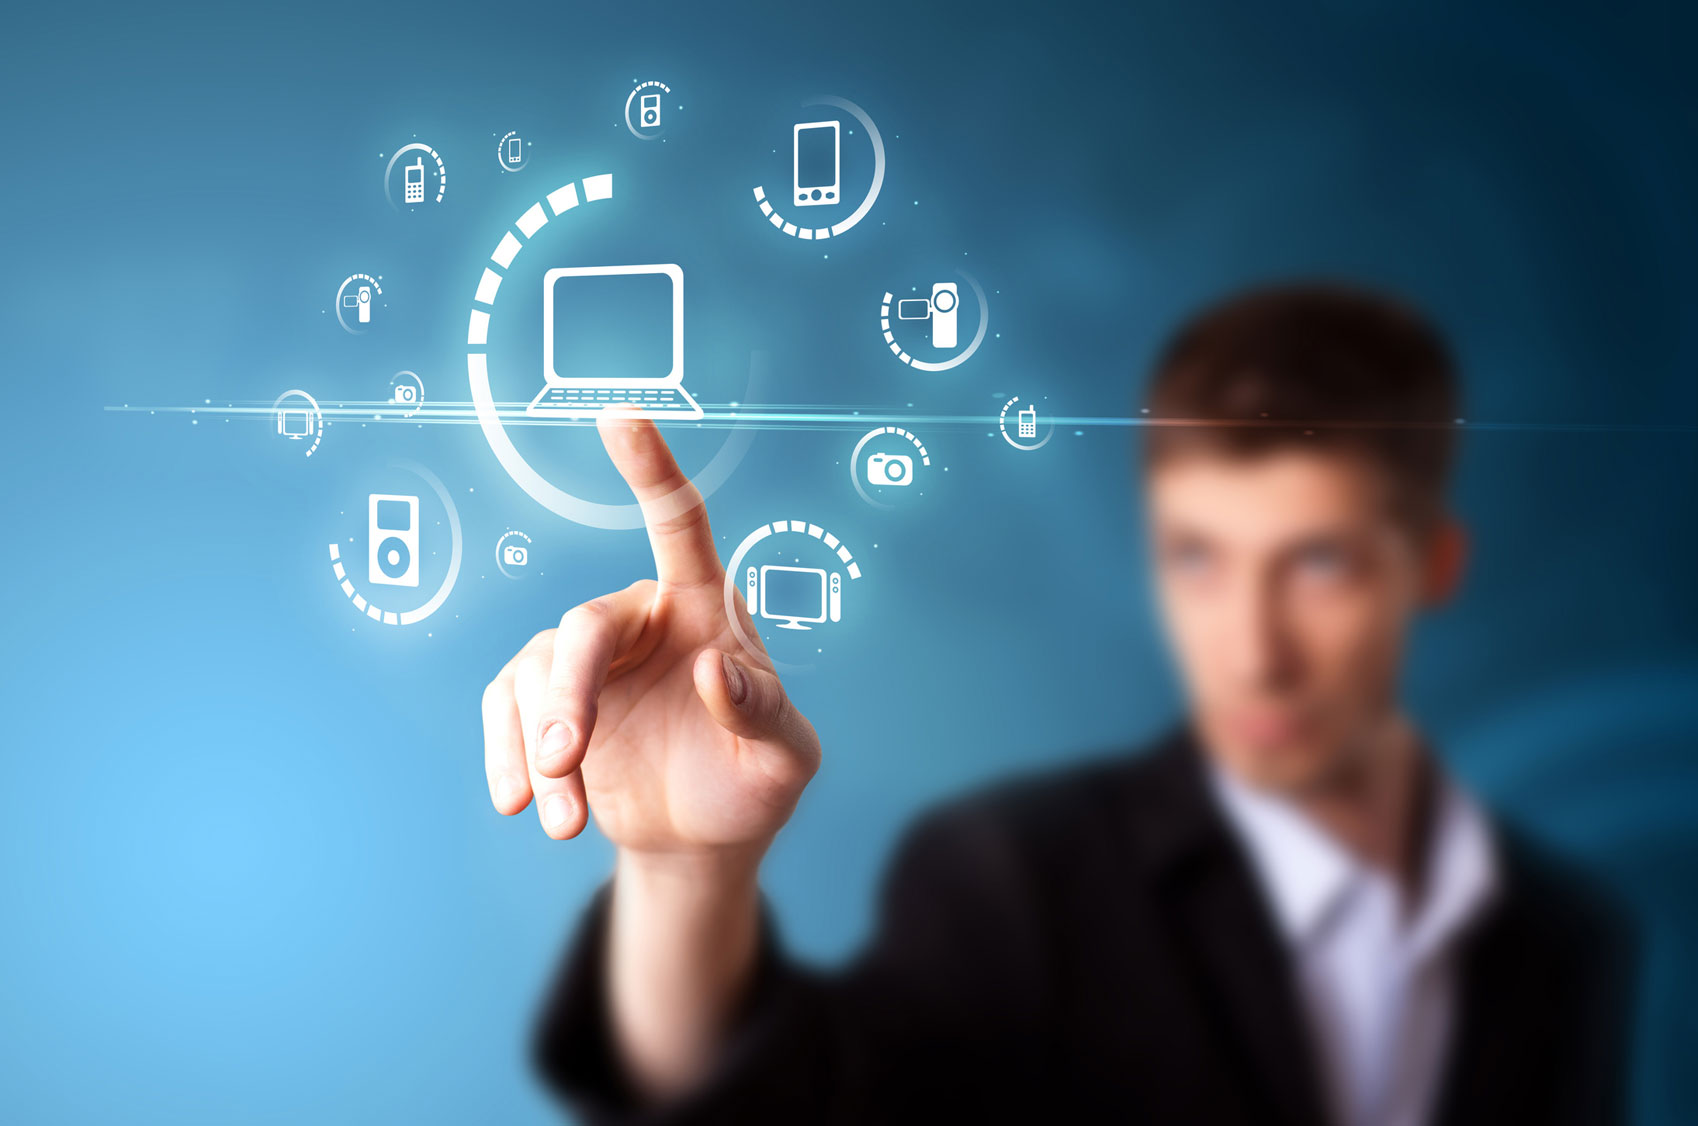 How do you make technology desirable